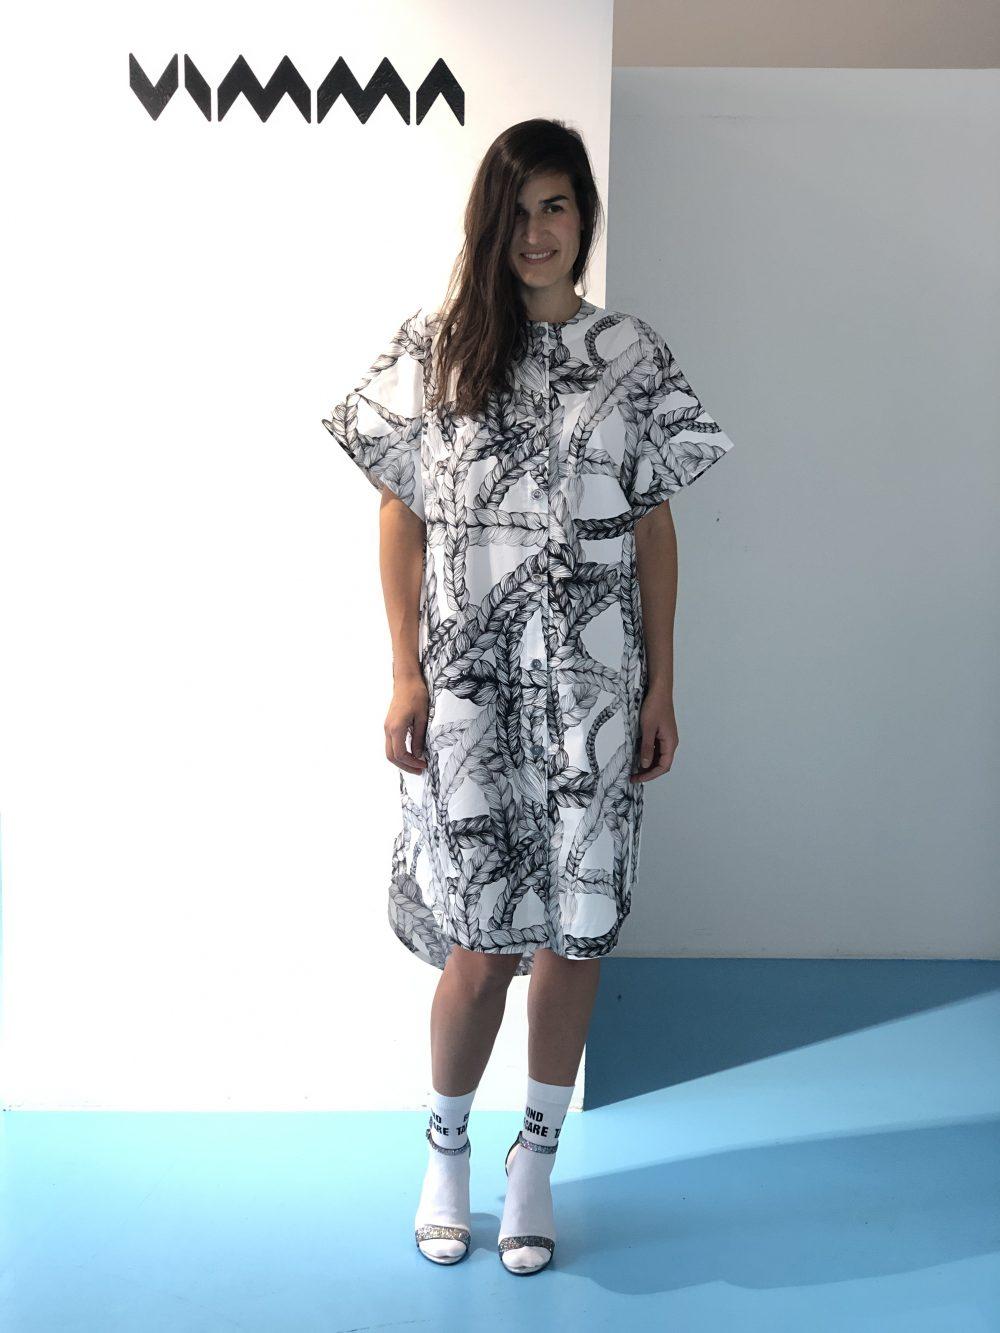 Vimma Dress SAARA letti black-white one size - black-white, braid, Dress, one size, SAARA